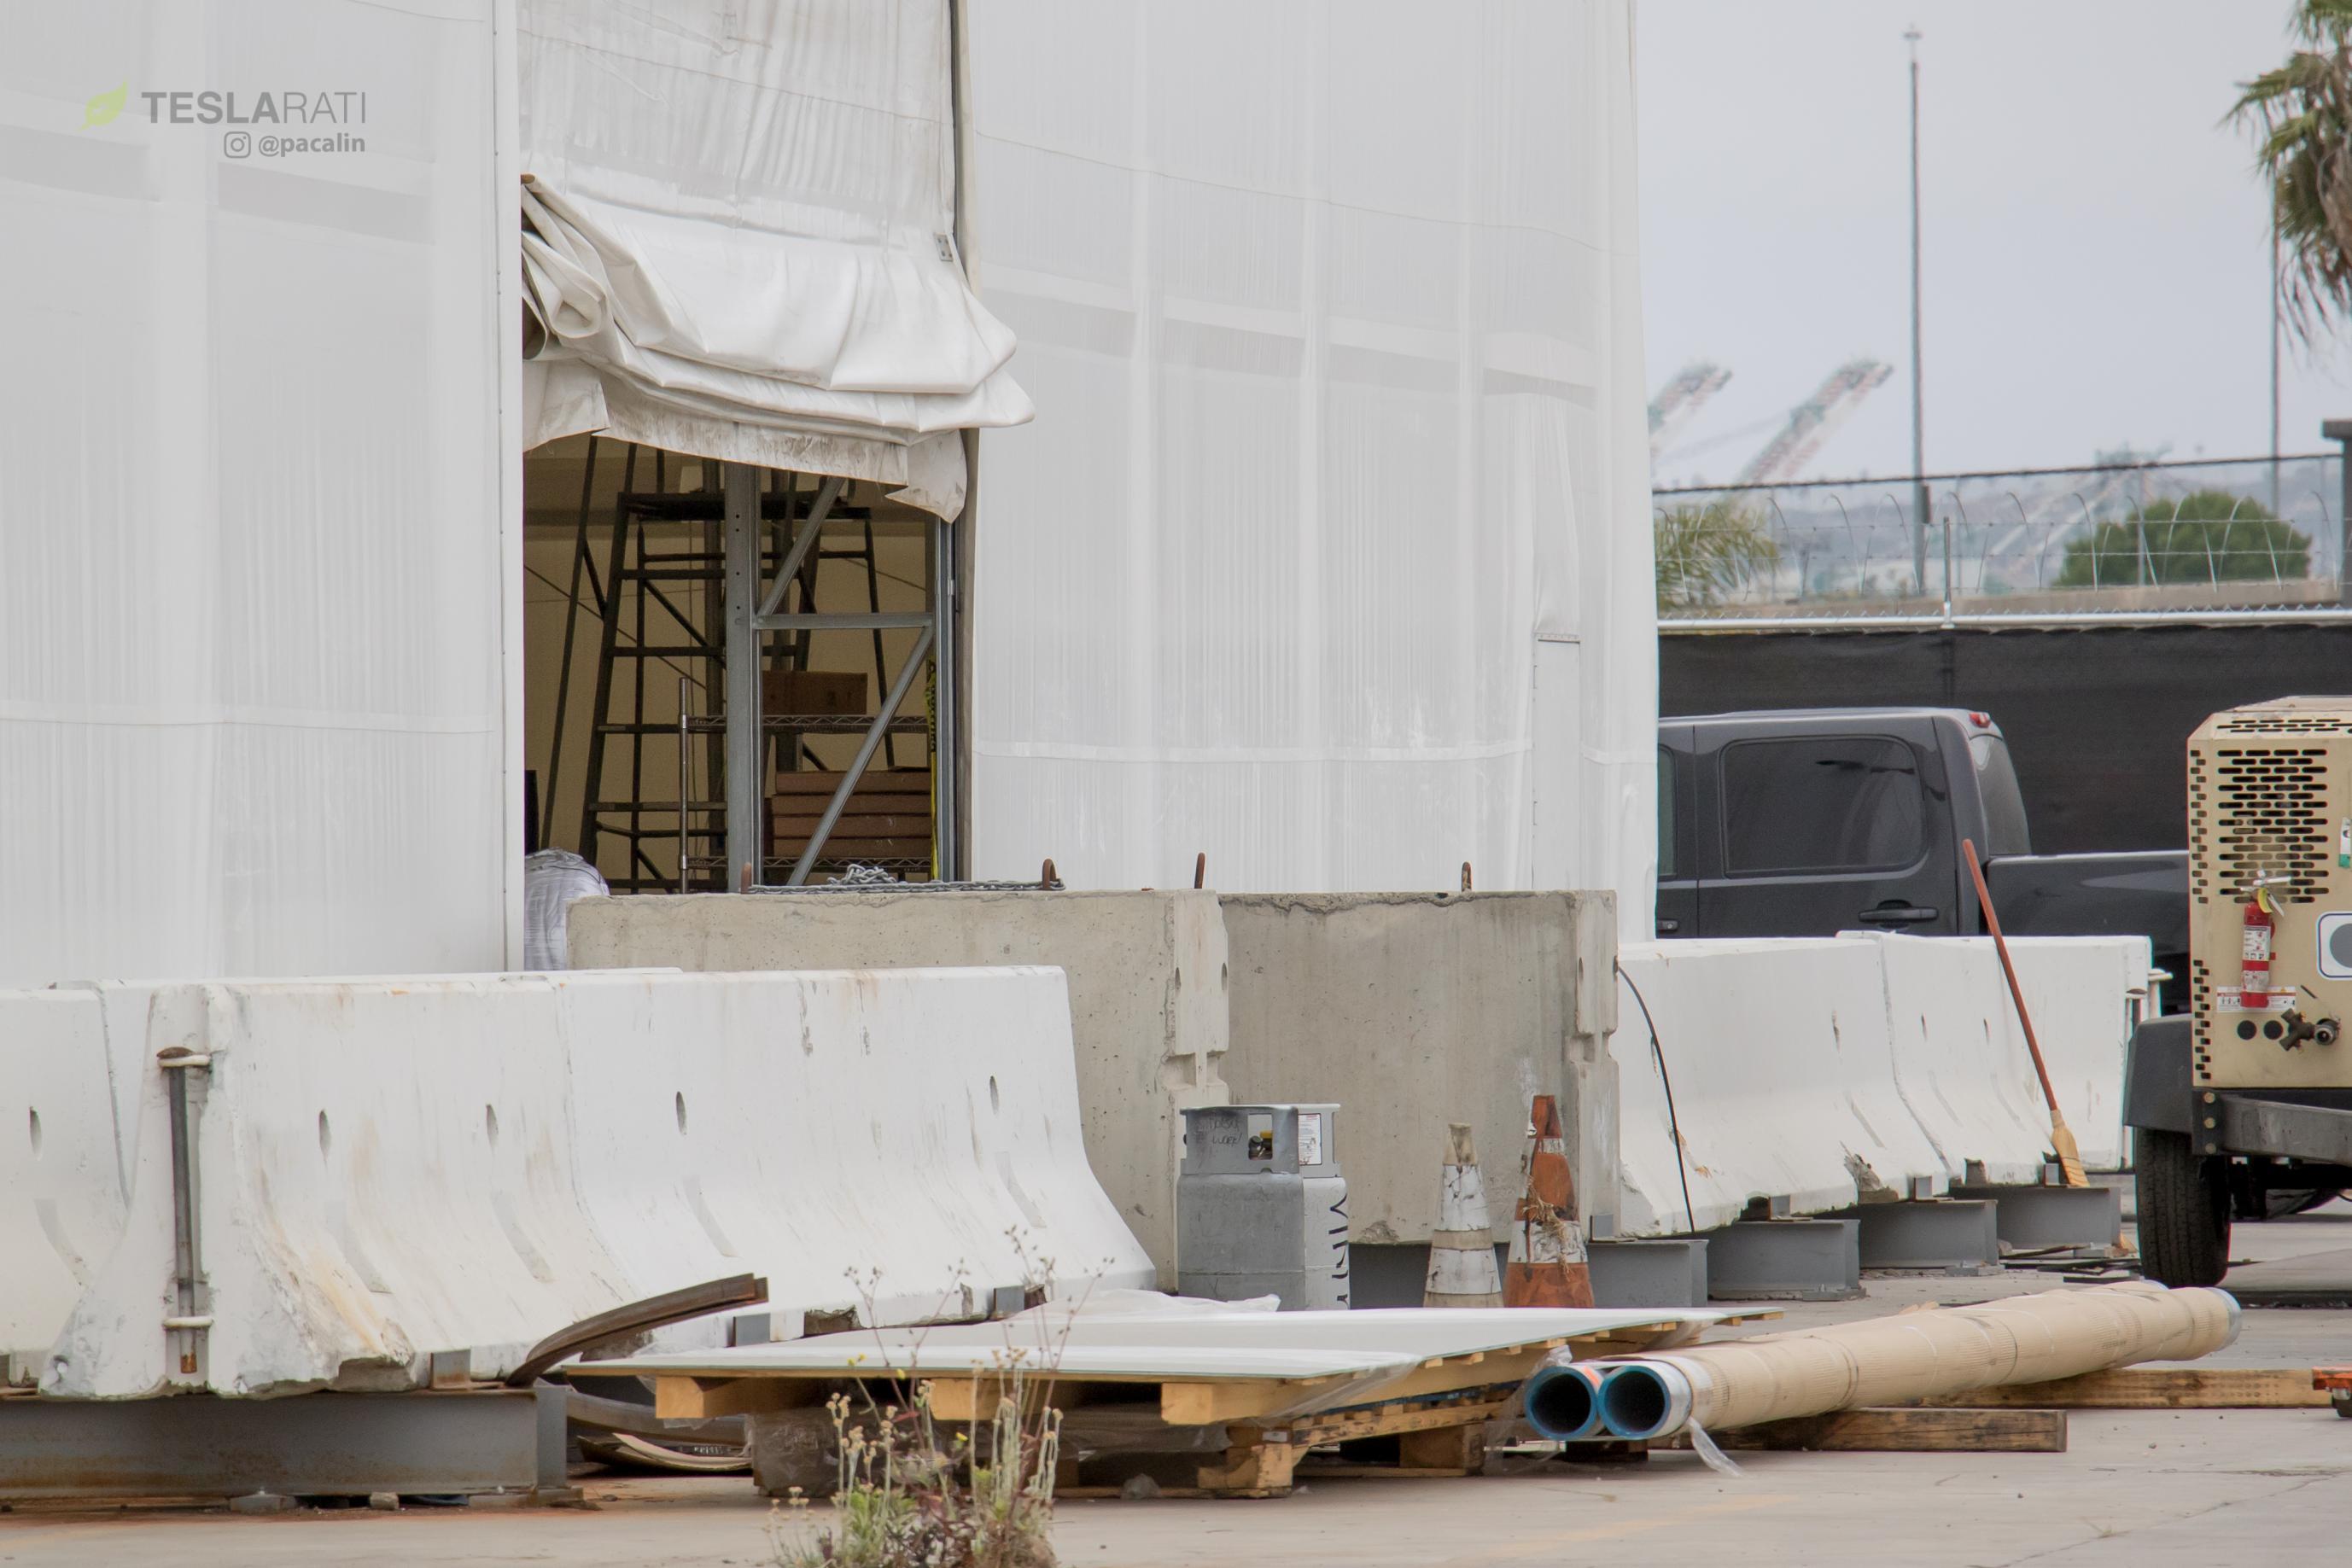 BFR tent tool move 050718 (Pauline Acalin) 3(c)